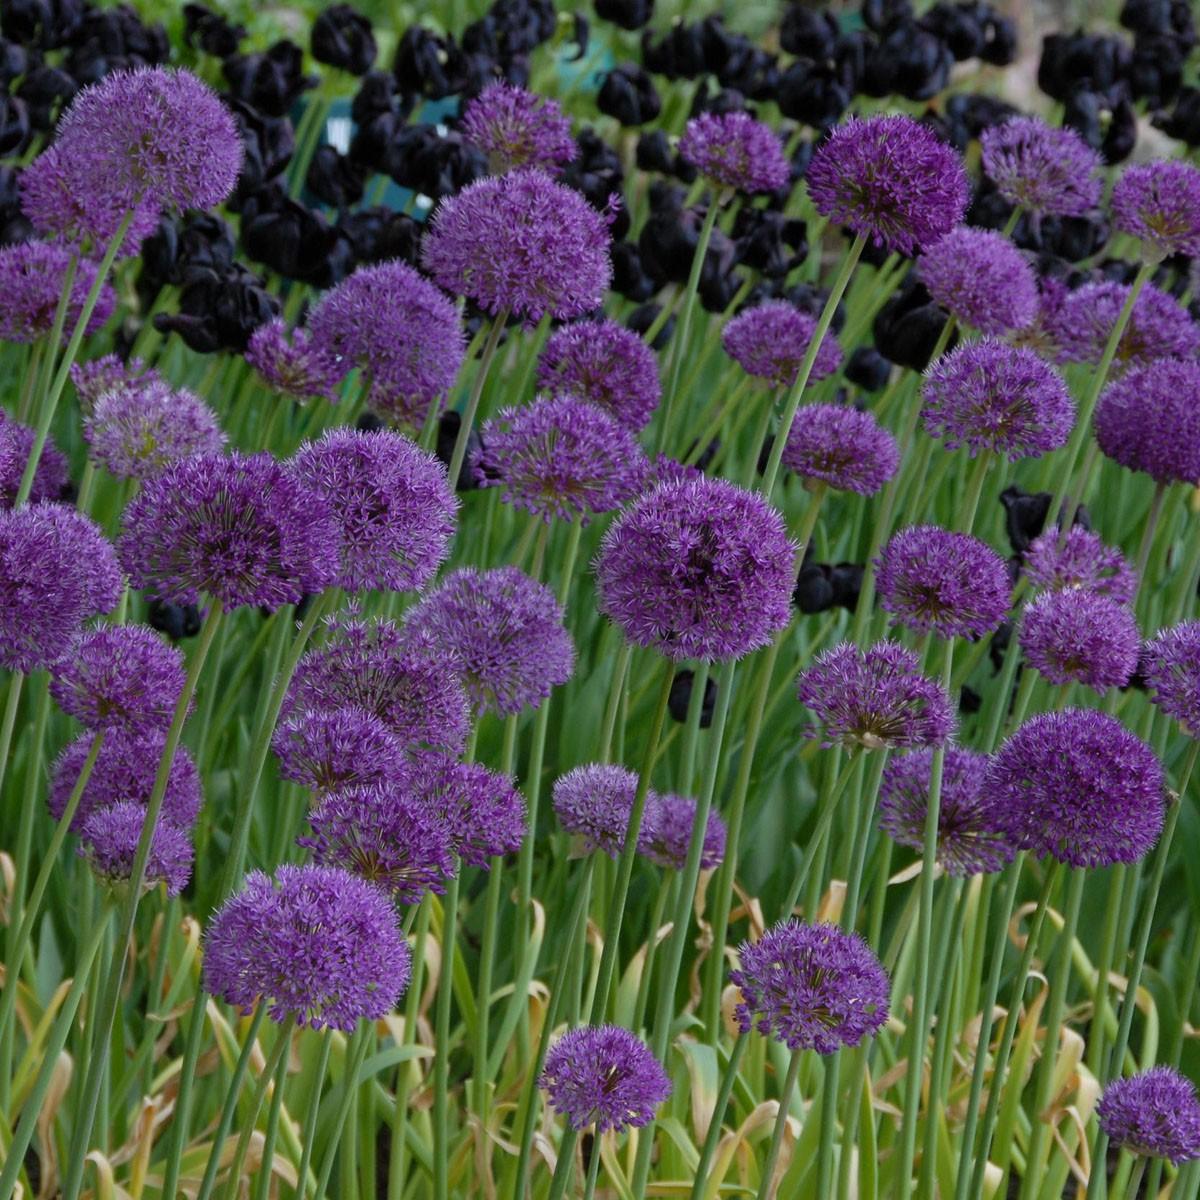 allium purple sensation de bloembol kraam. Black Bedroom Furniture Sets. Home Design Ideas